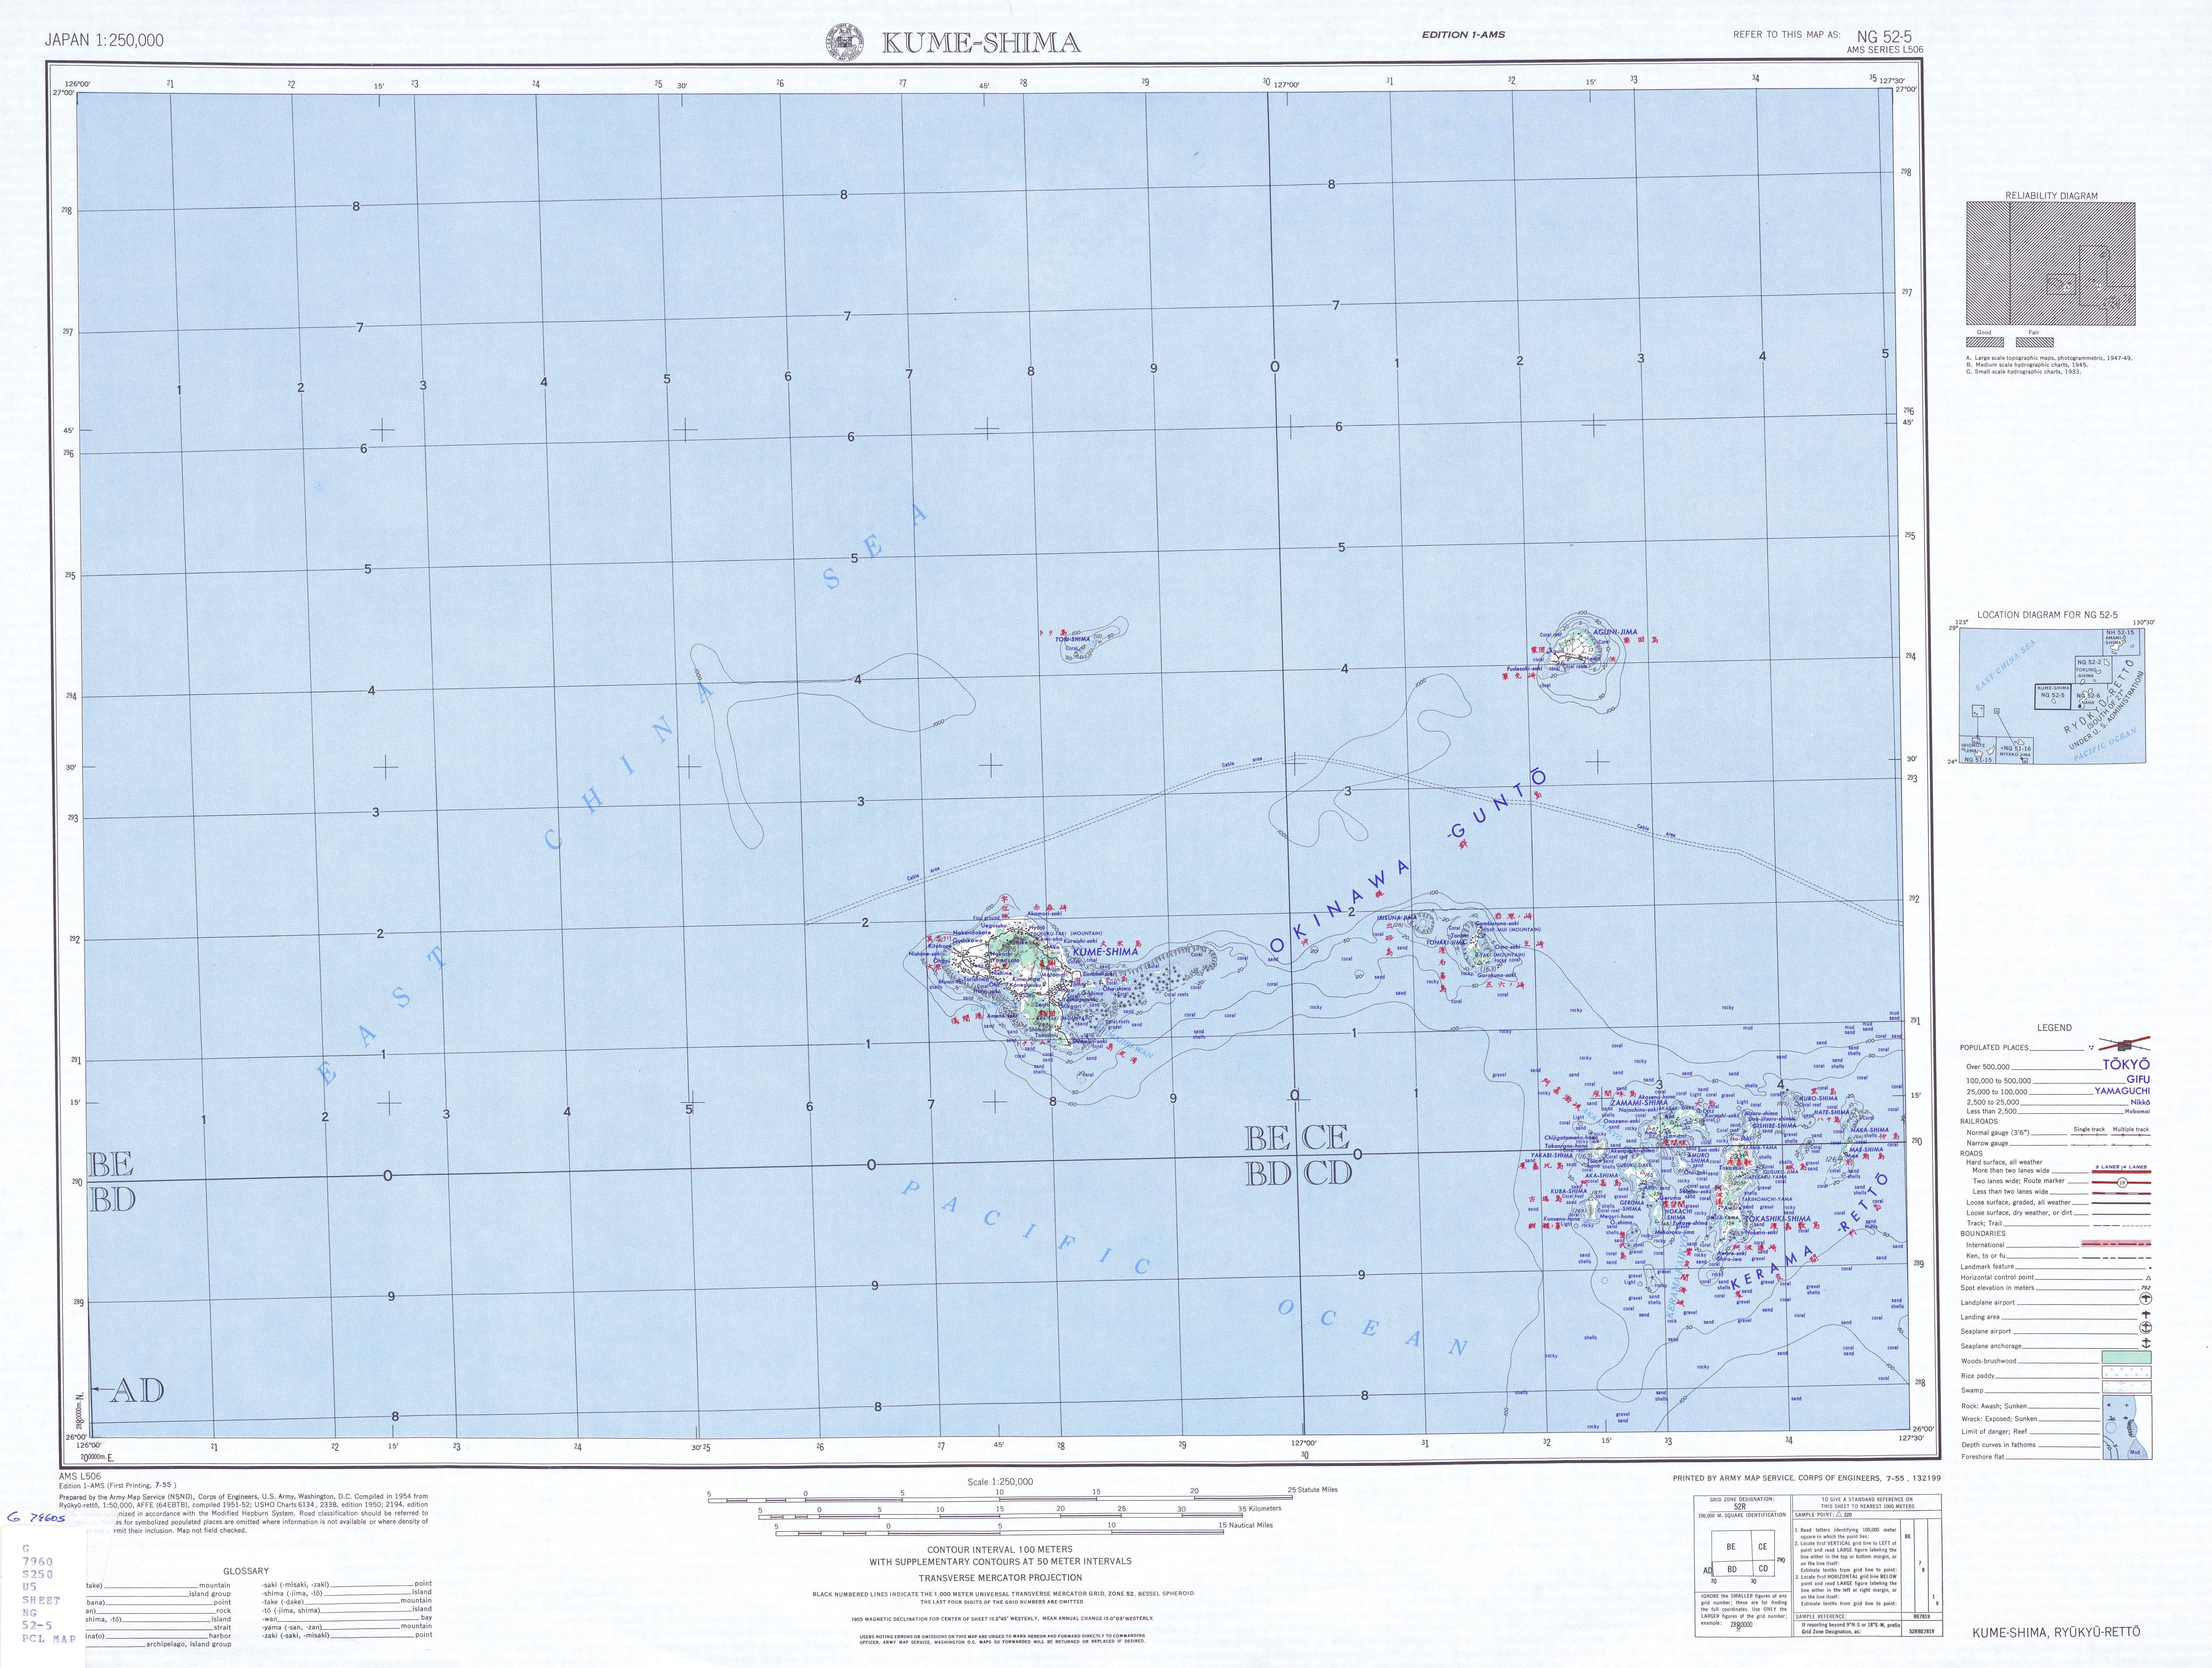 Kume-Shima Topographic Map Sheet, Japan 1954